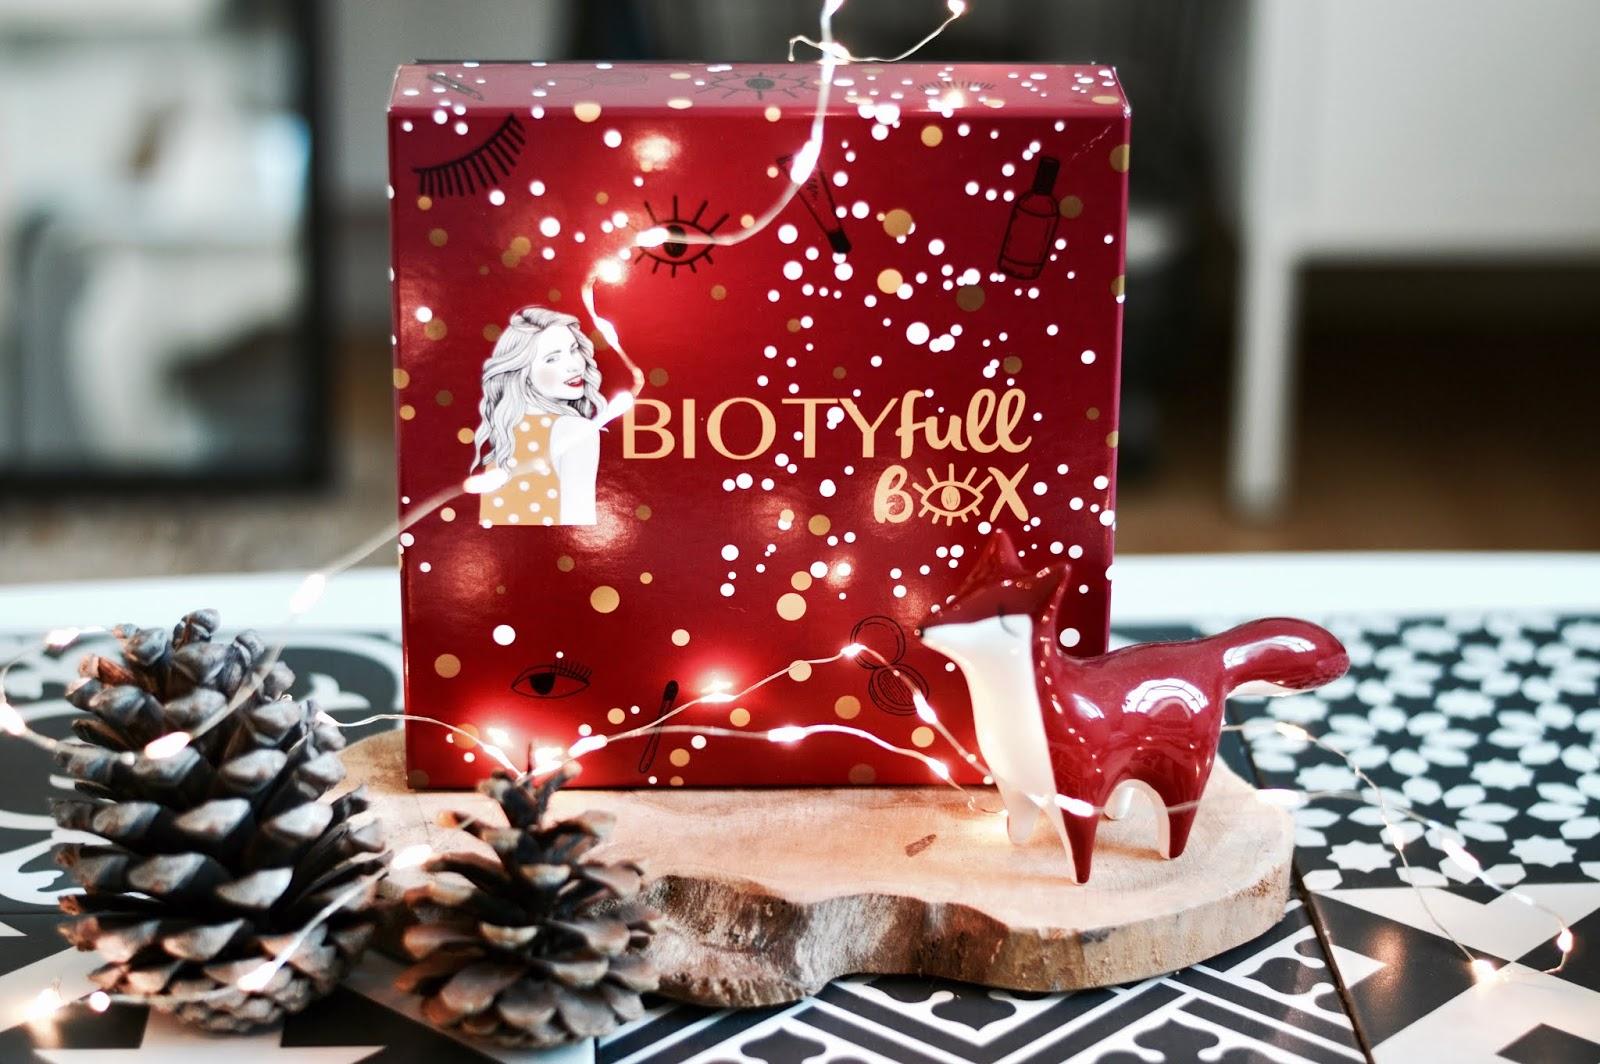 Box beauté bio - BIOTYFULL BOX l'Emerveillée -- prendre soin de ses yeux